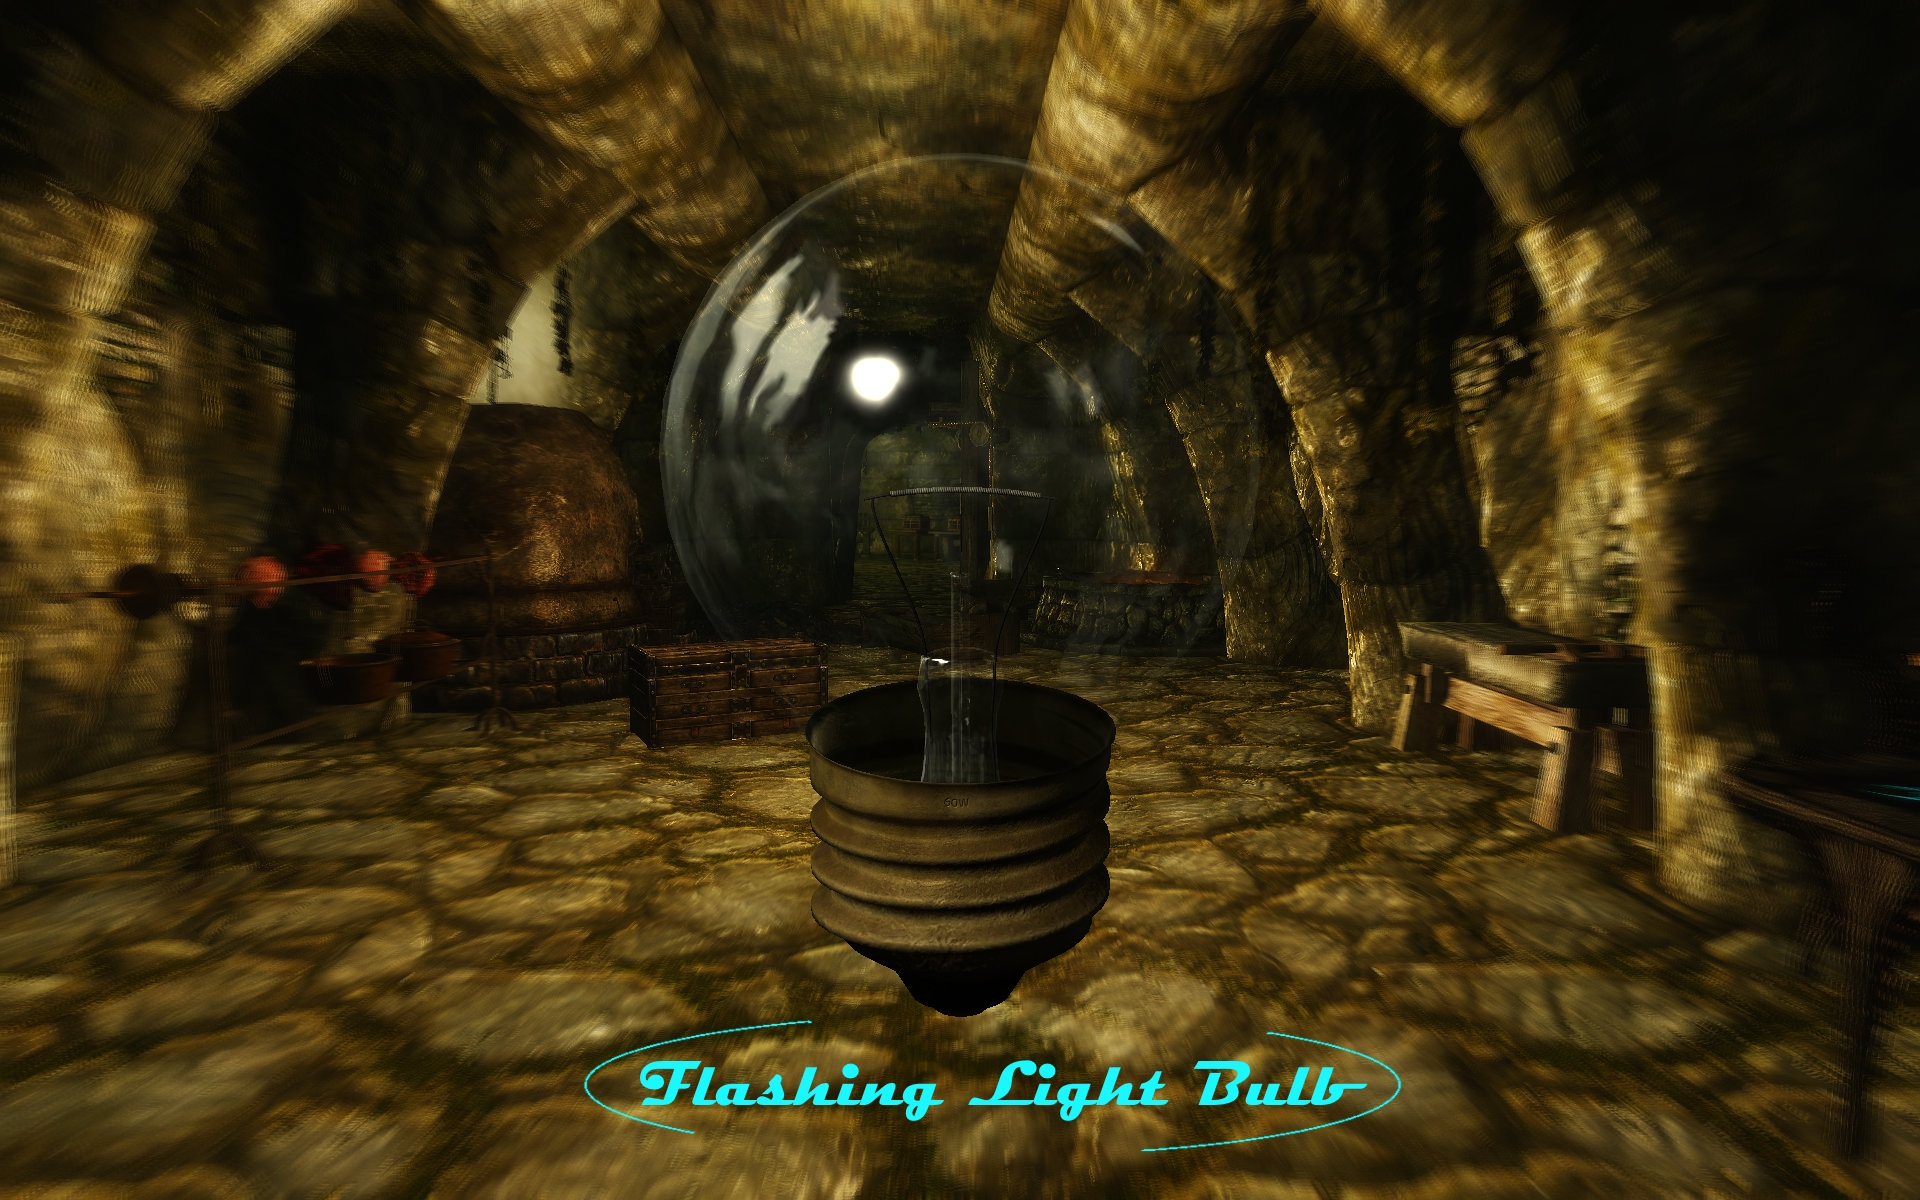 Flashing_Light_Bulb.jpg